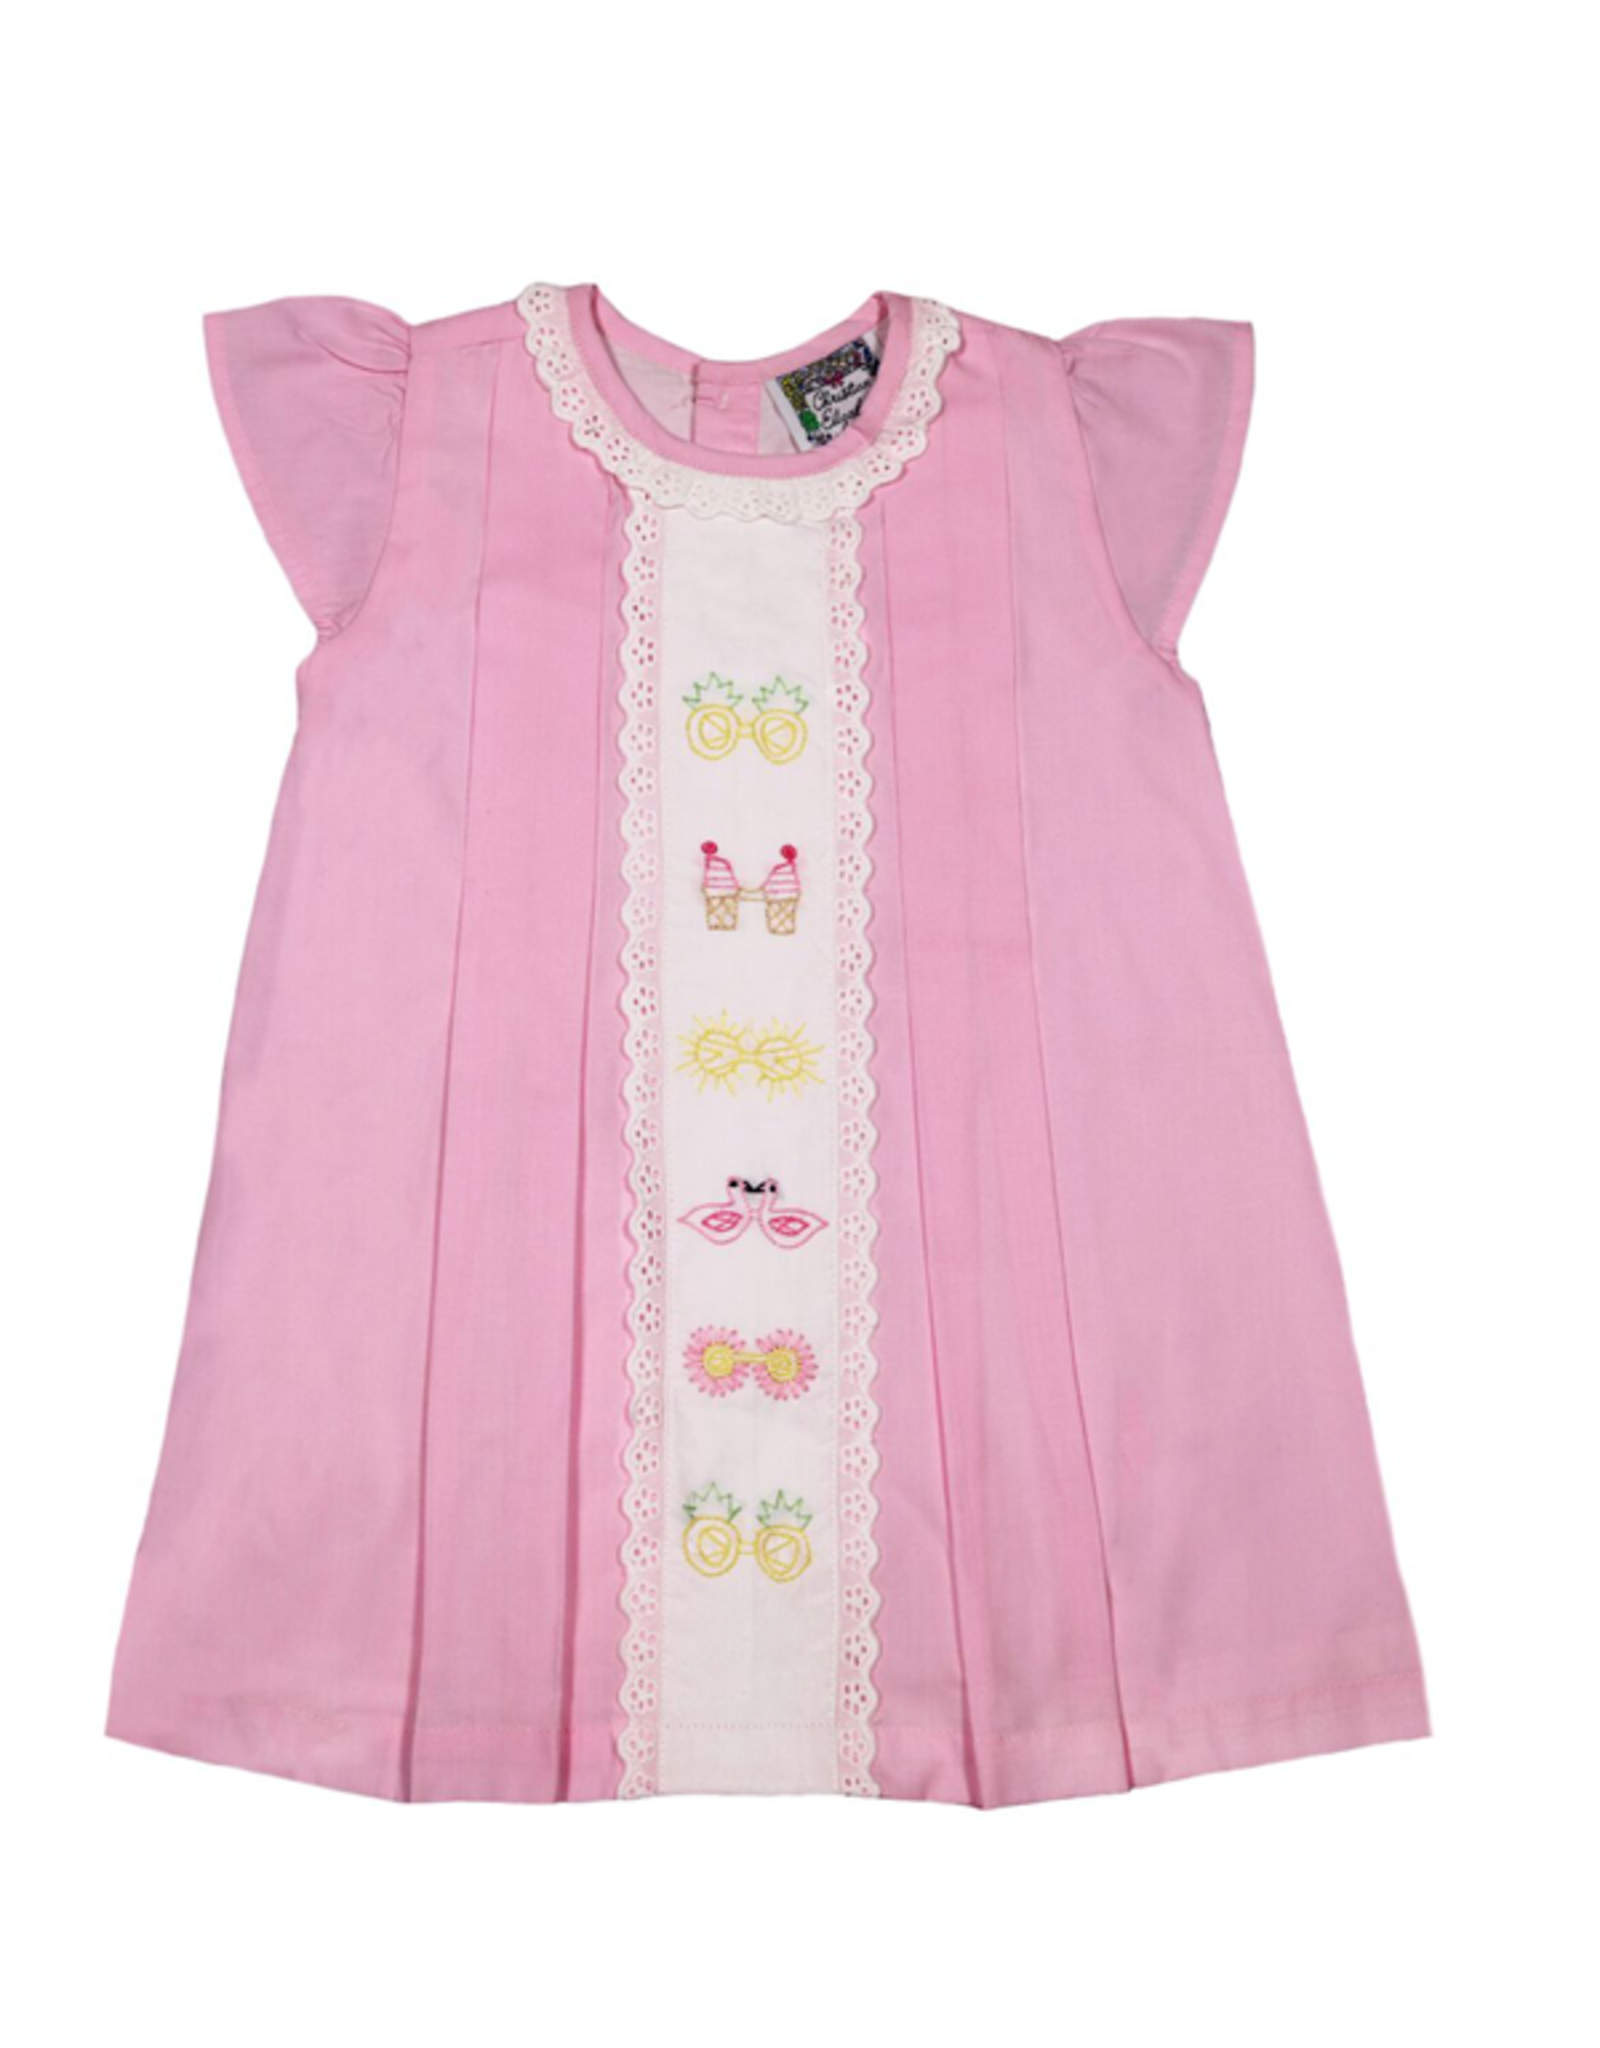 Christian Elizabeth Pink Whitby Shades Dress